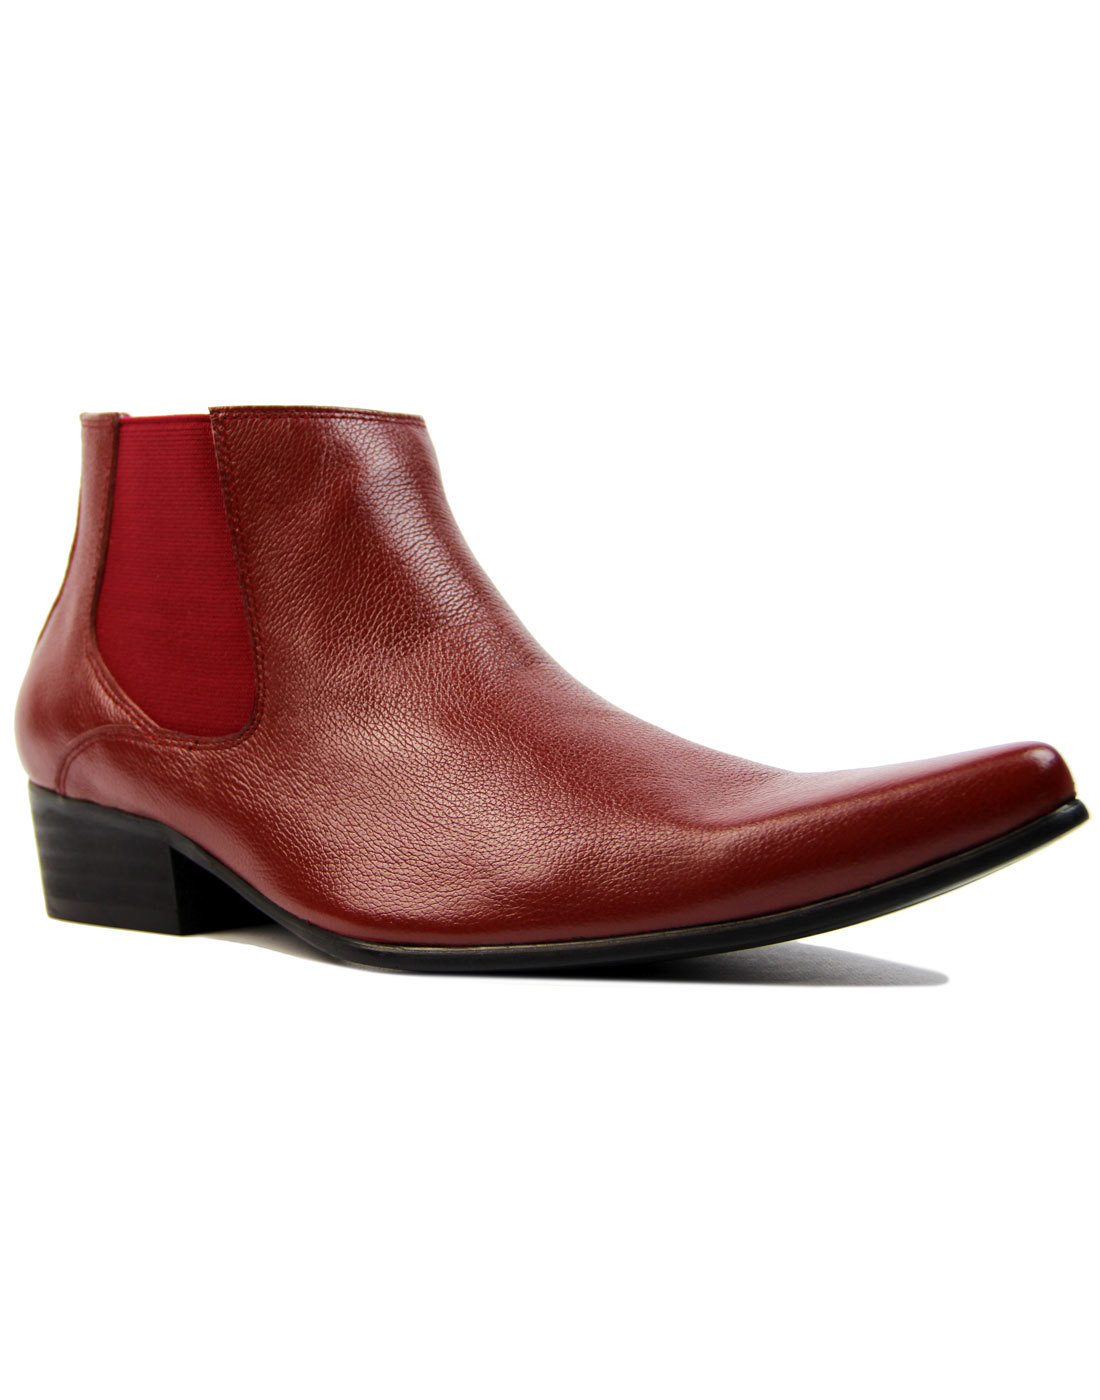 madcap england dexter mod red cuban chelsea boots